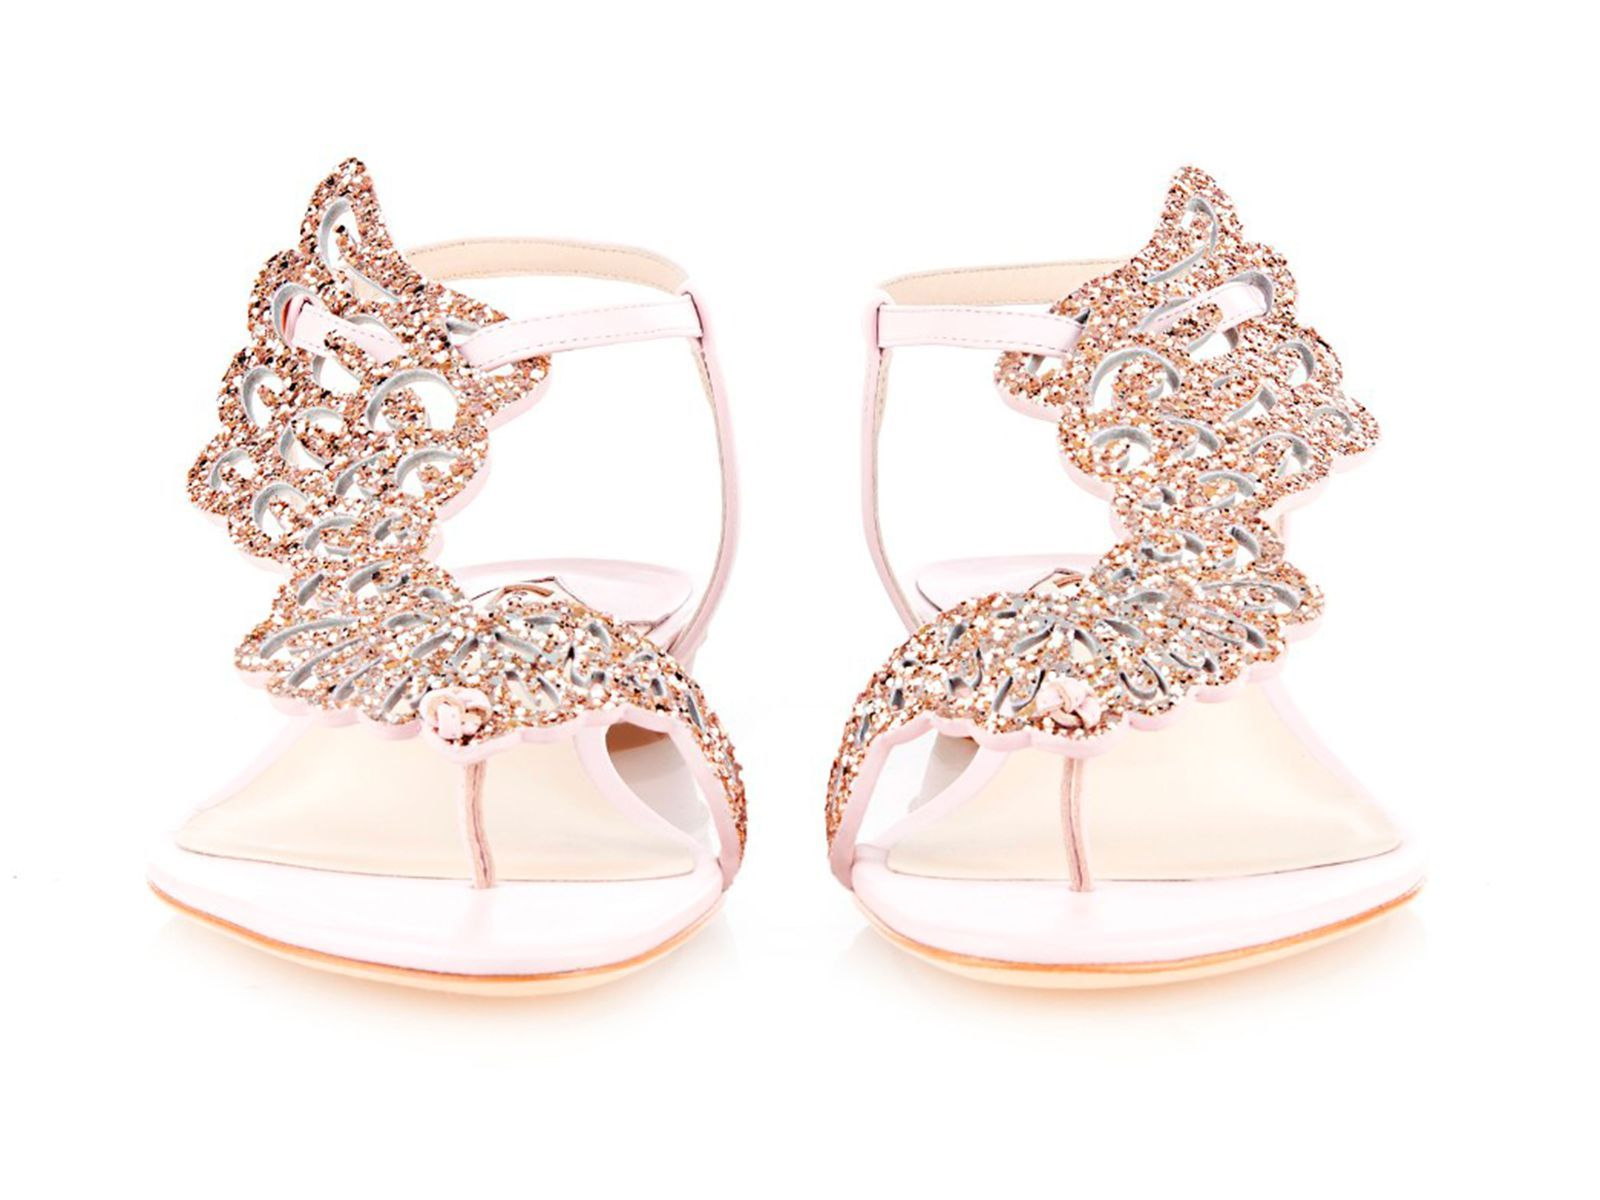 Bridal shoes, Fun wedding shoes